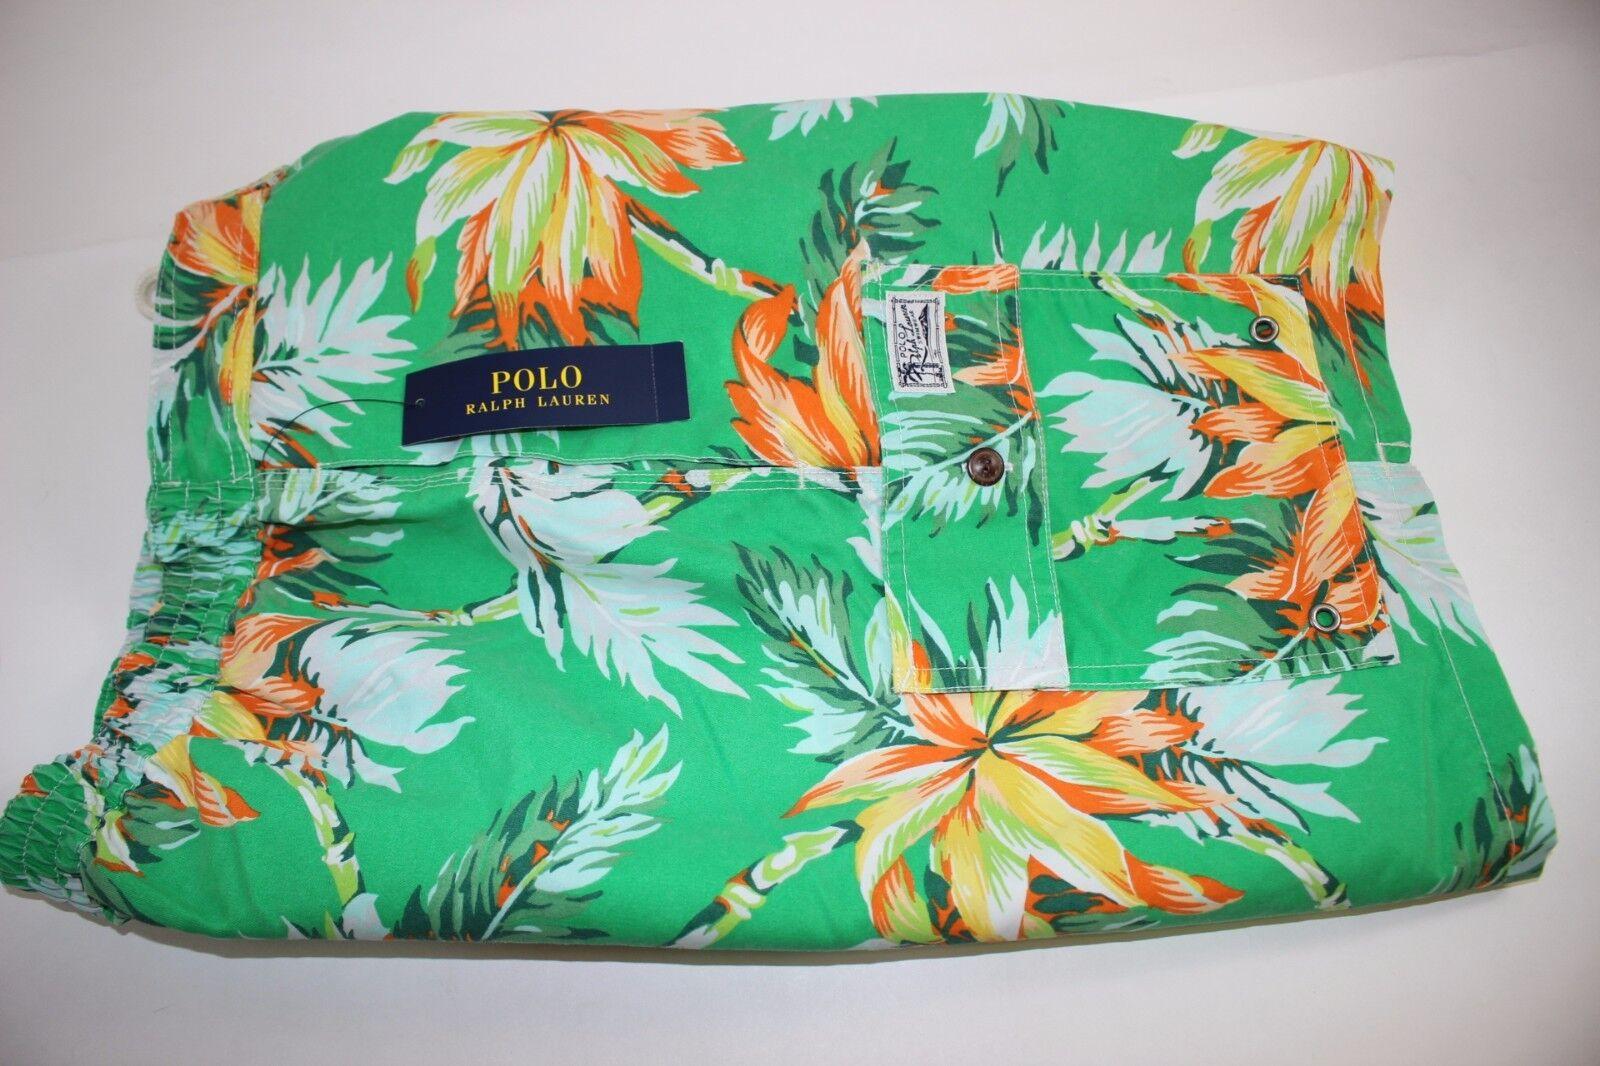 NWT RALPH LAUREN Size Small Men's Green ISLAND PALM Print POLO Swim Wear Trunks